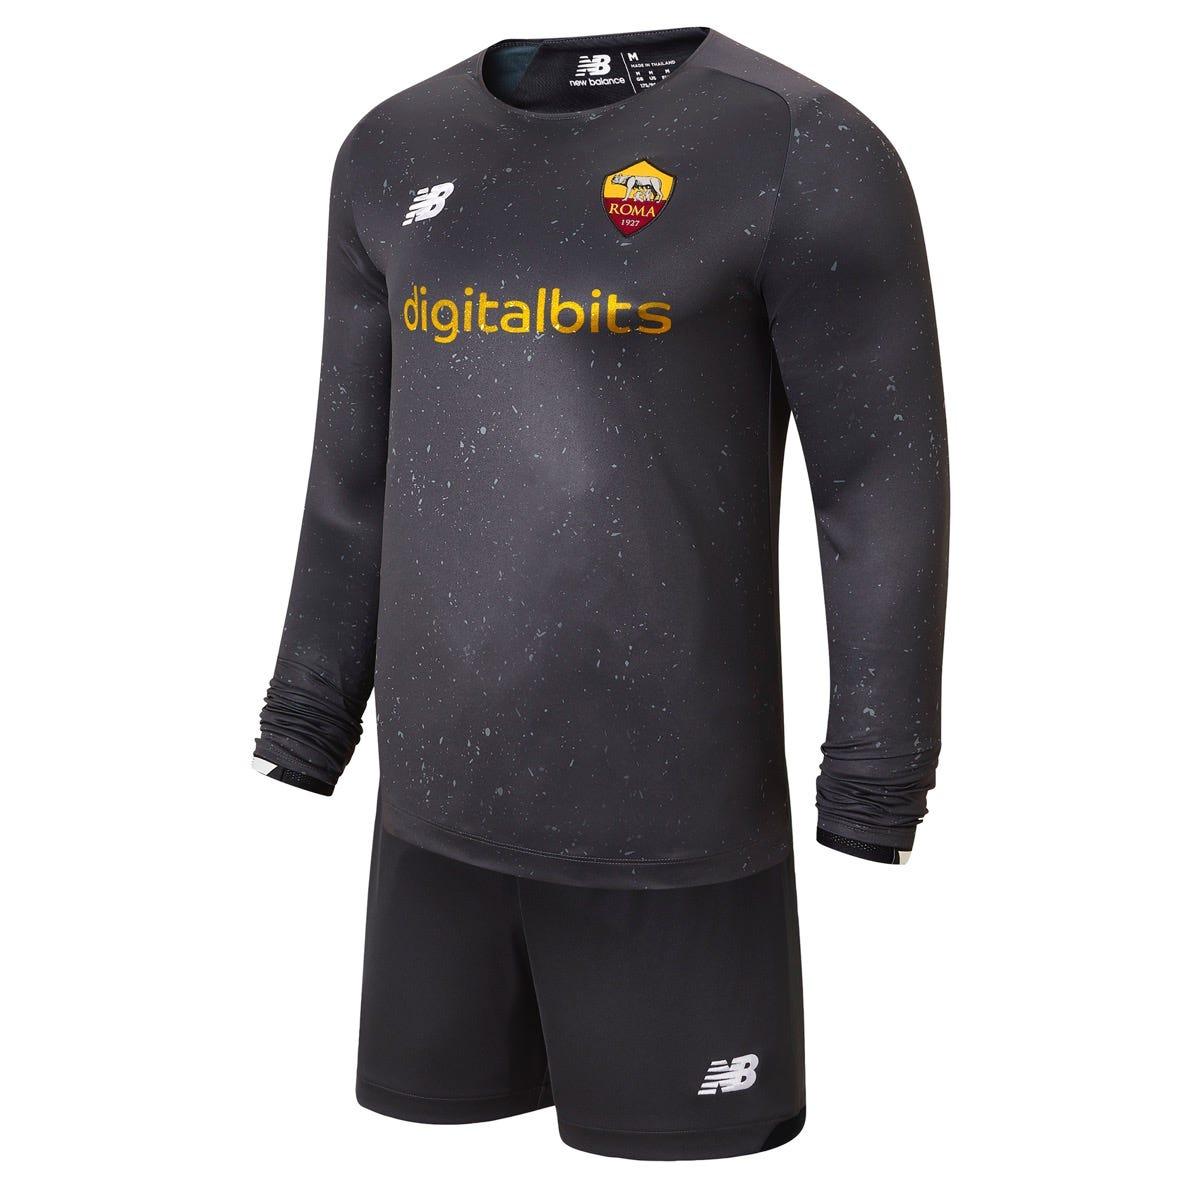 Kit Home Goal Keeper Kids T-Shirt, Short and Socks 2021/22 w/t free Face Mask